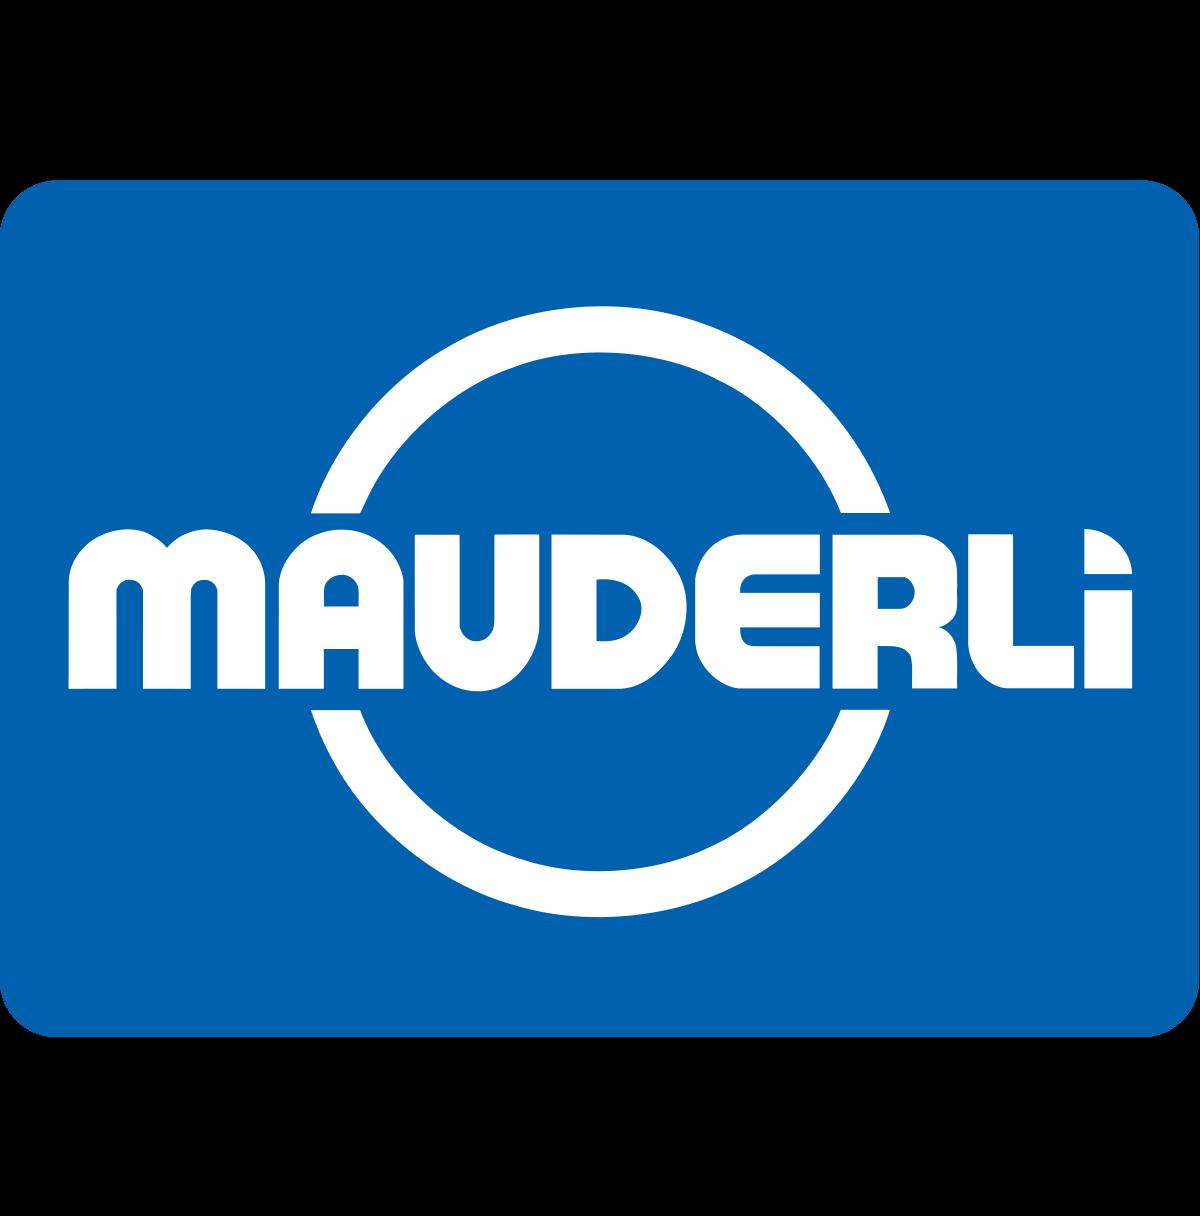 Mauderli